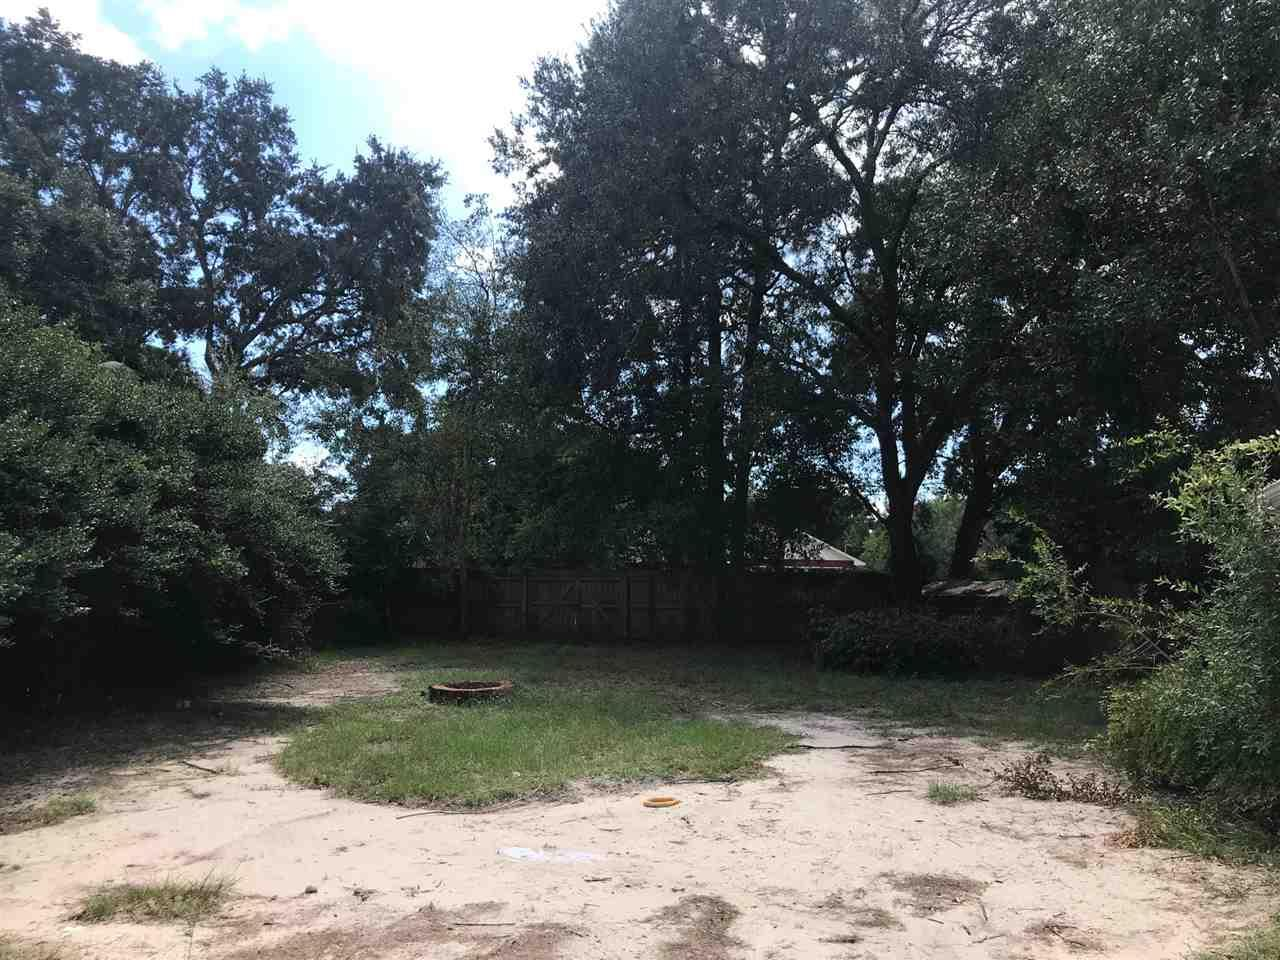 342 Petherton Pl, Pensacola, FL 32506